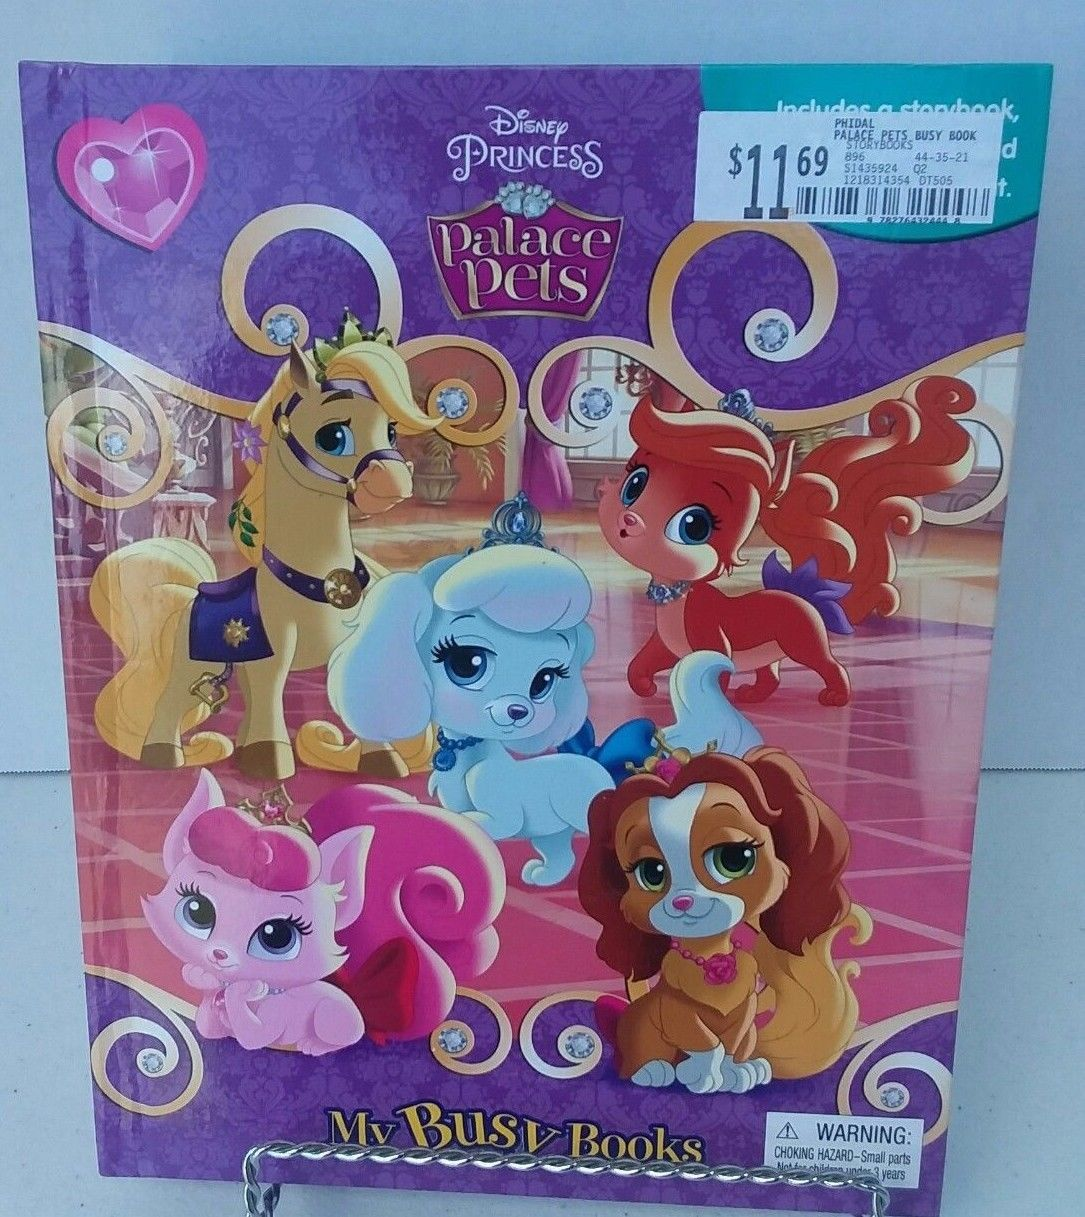 Disney Princess Storybook Palace Pets Complete Set 12 Figurines 1playmat Ages 3 Disney Princess Toys Palace Pets Storybook